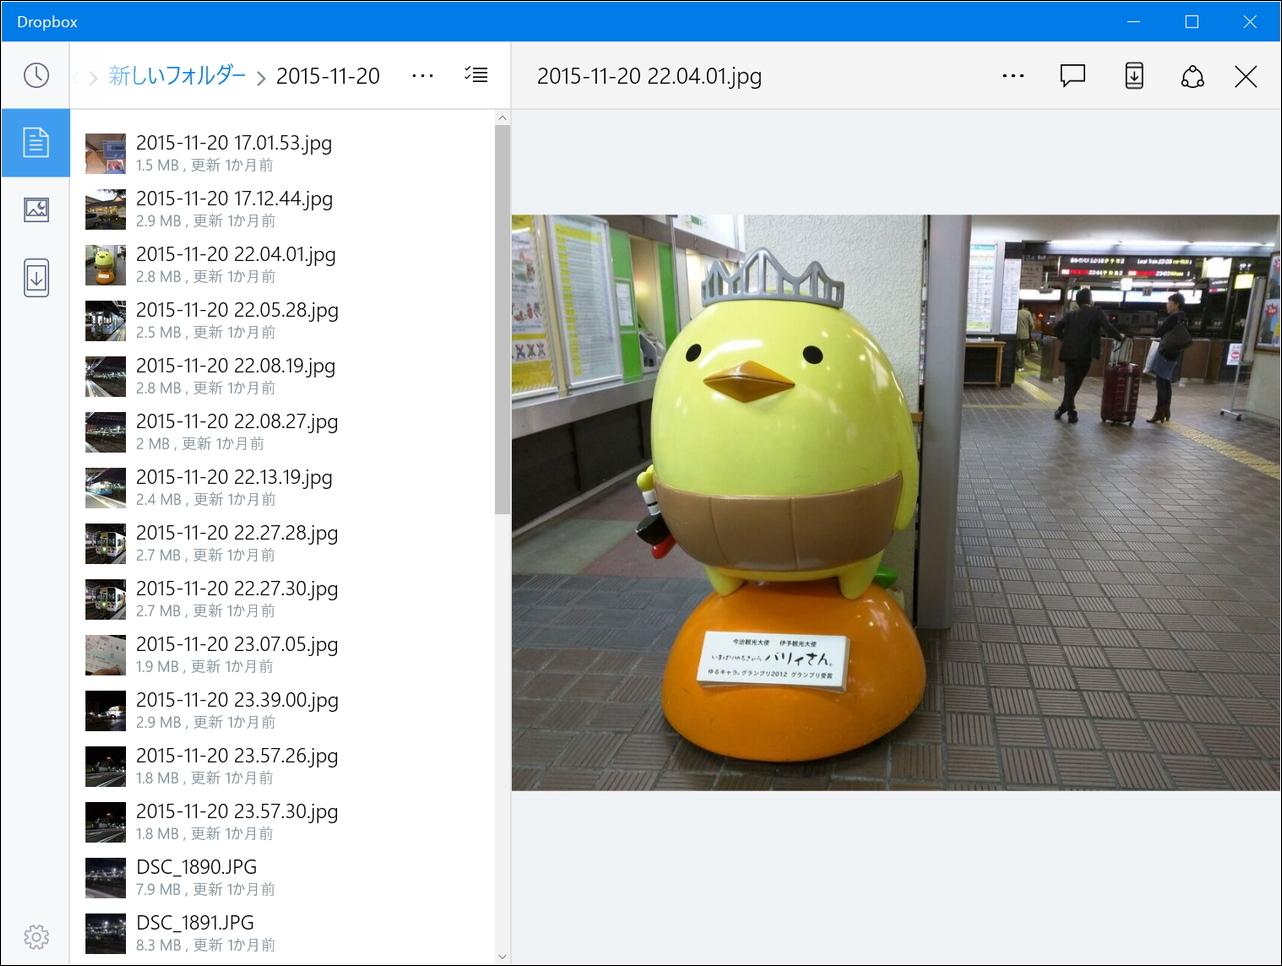 「Dropbox」v4.0.0.0